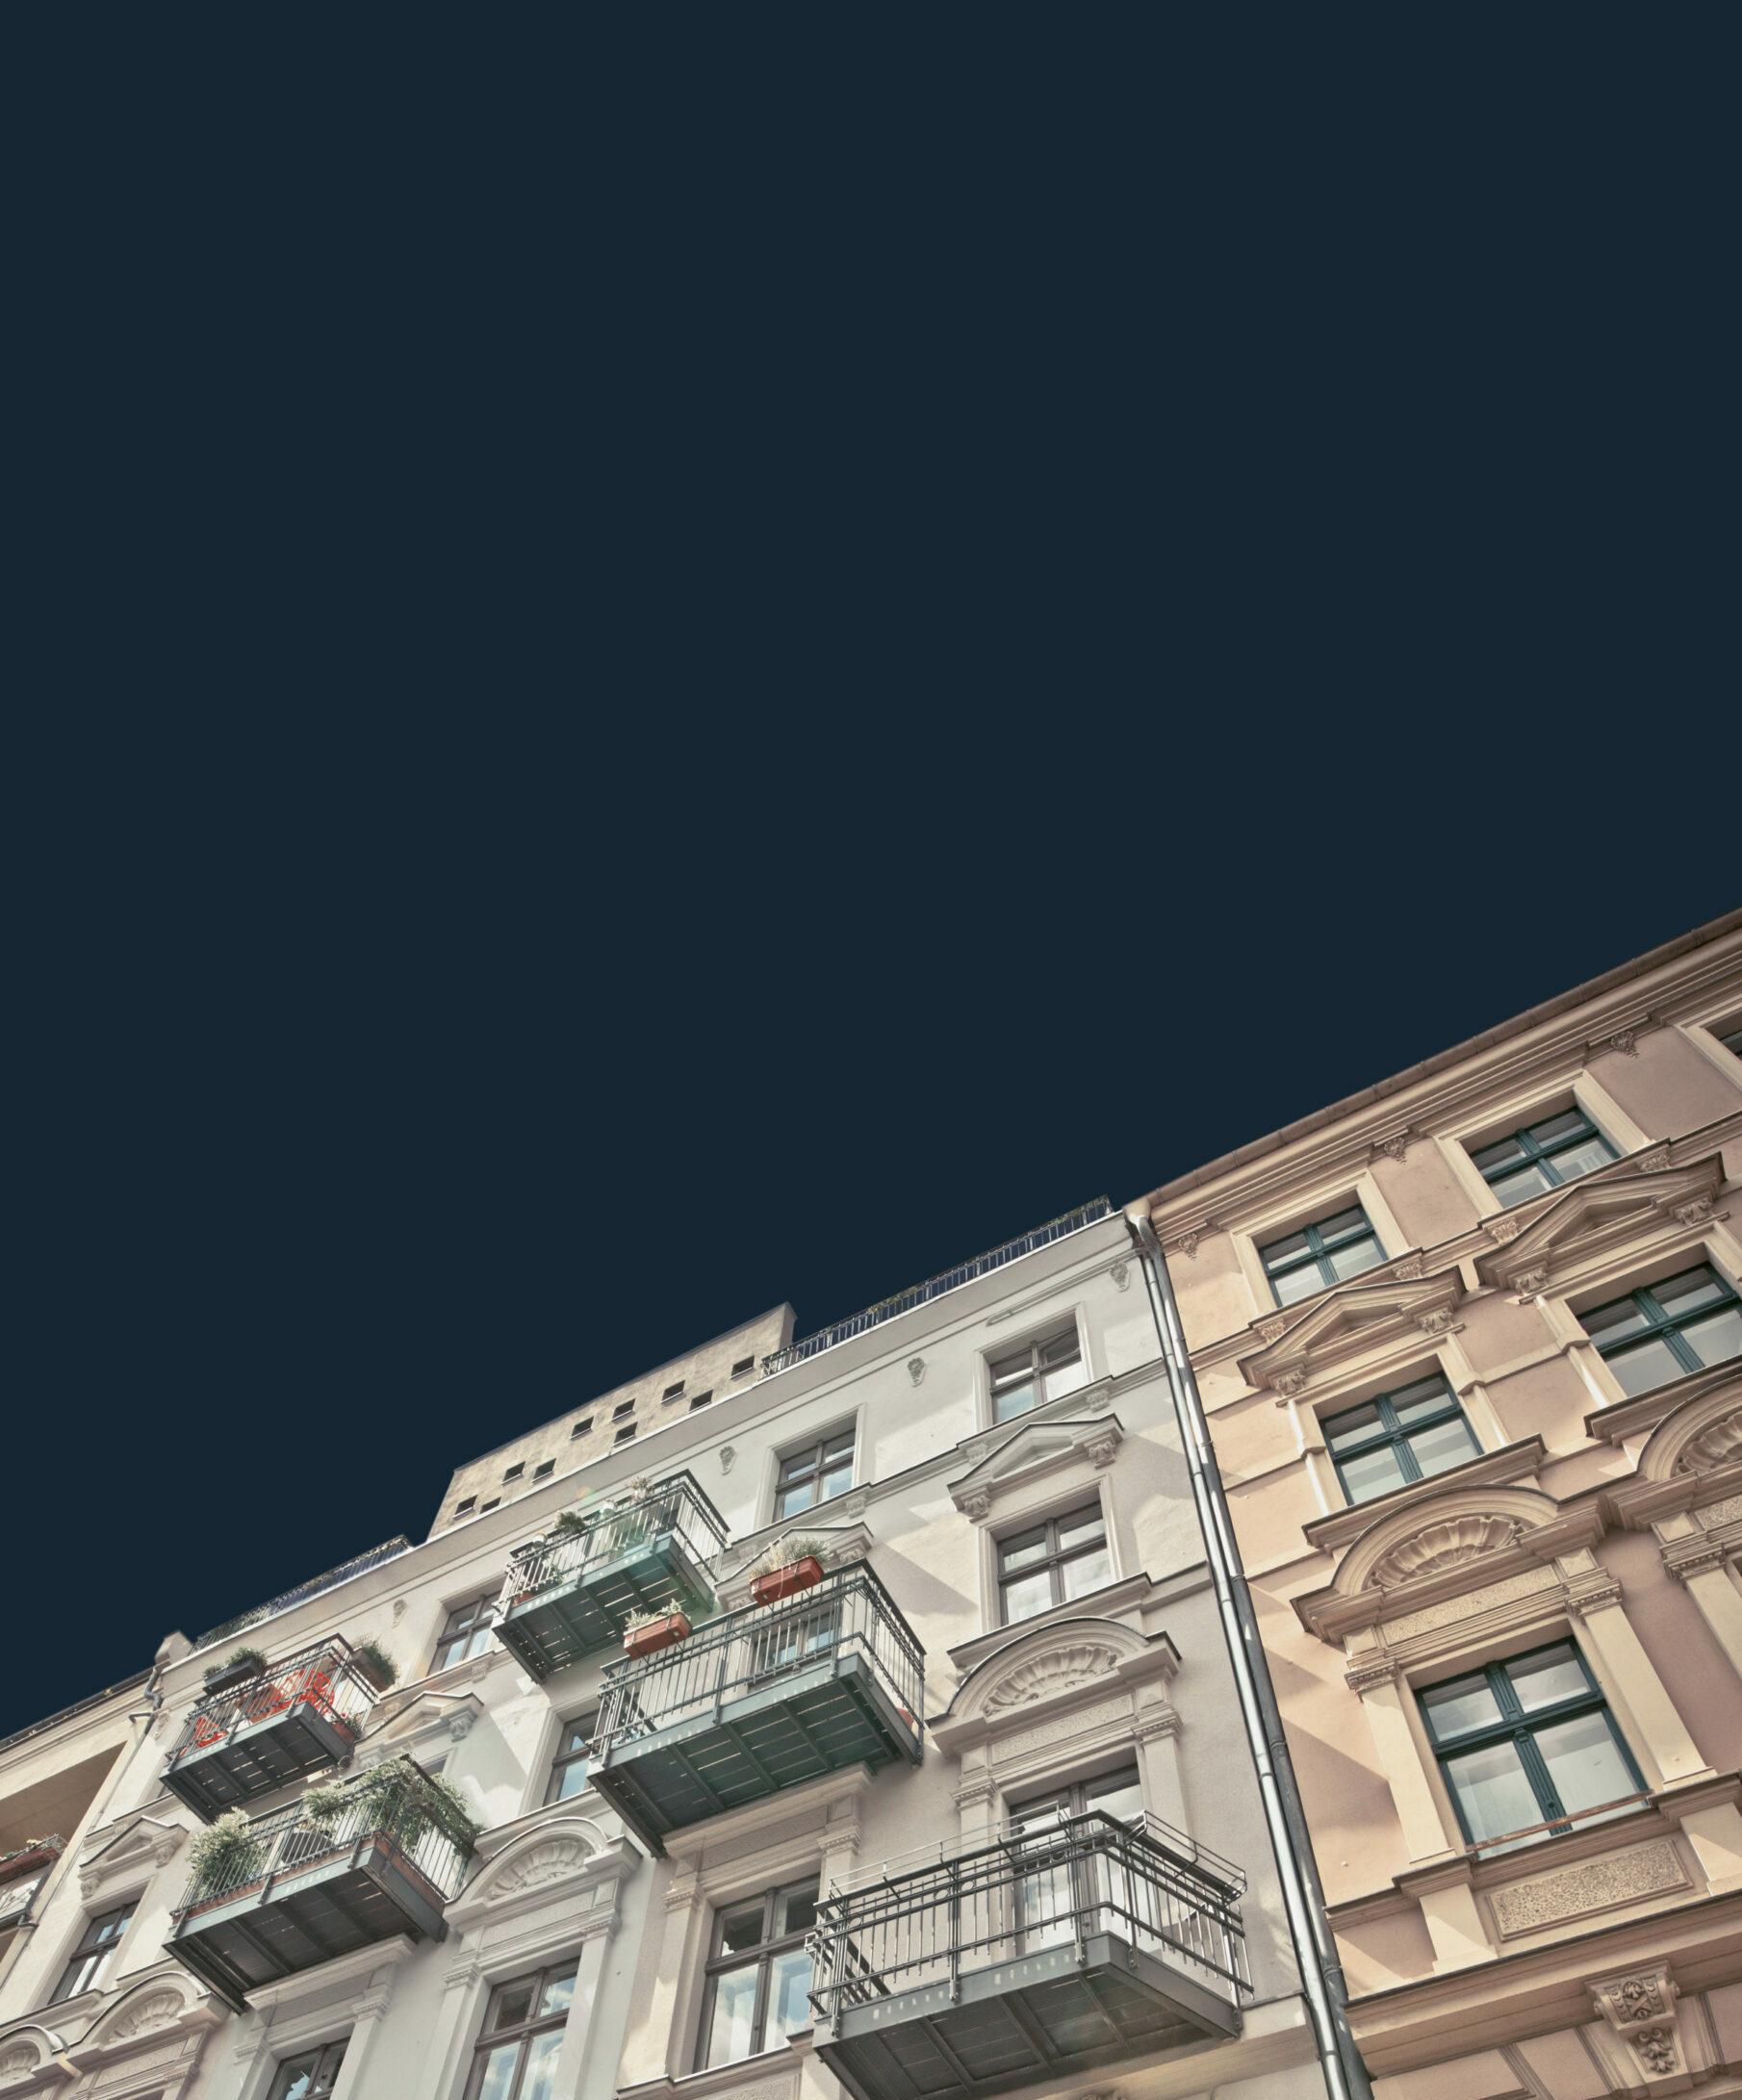 201001 Colliers Residential WoMa Dtsch Titel Bild